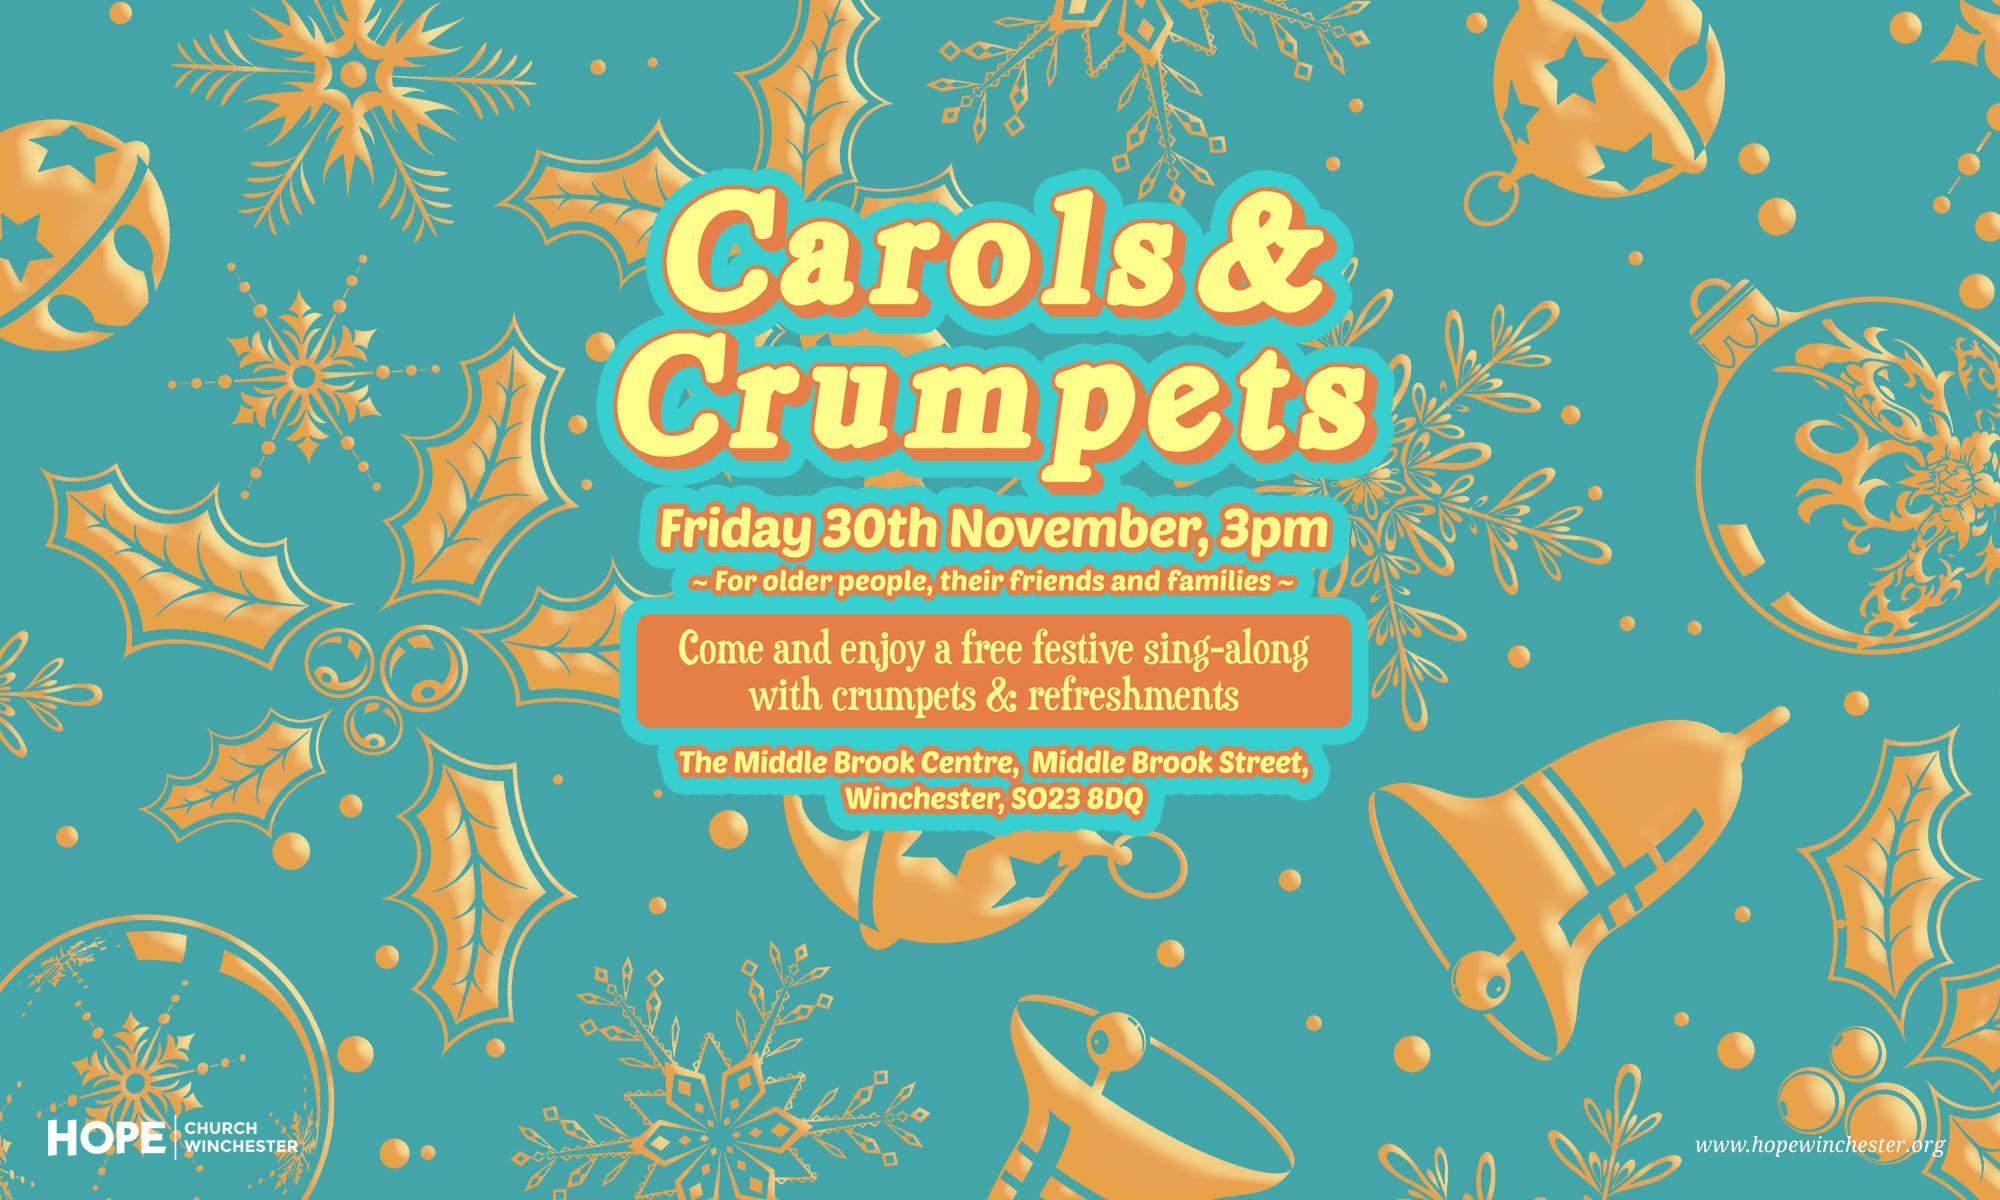 W-Home-Carols-Crumpets